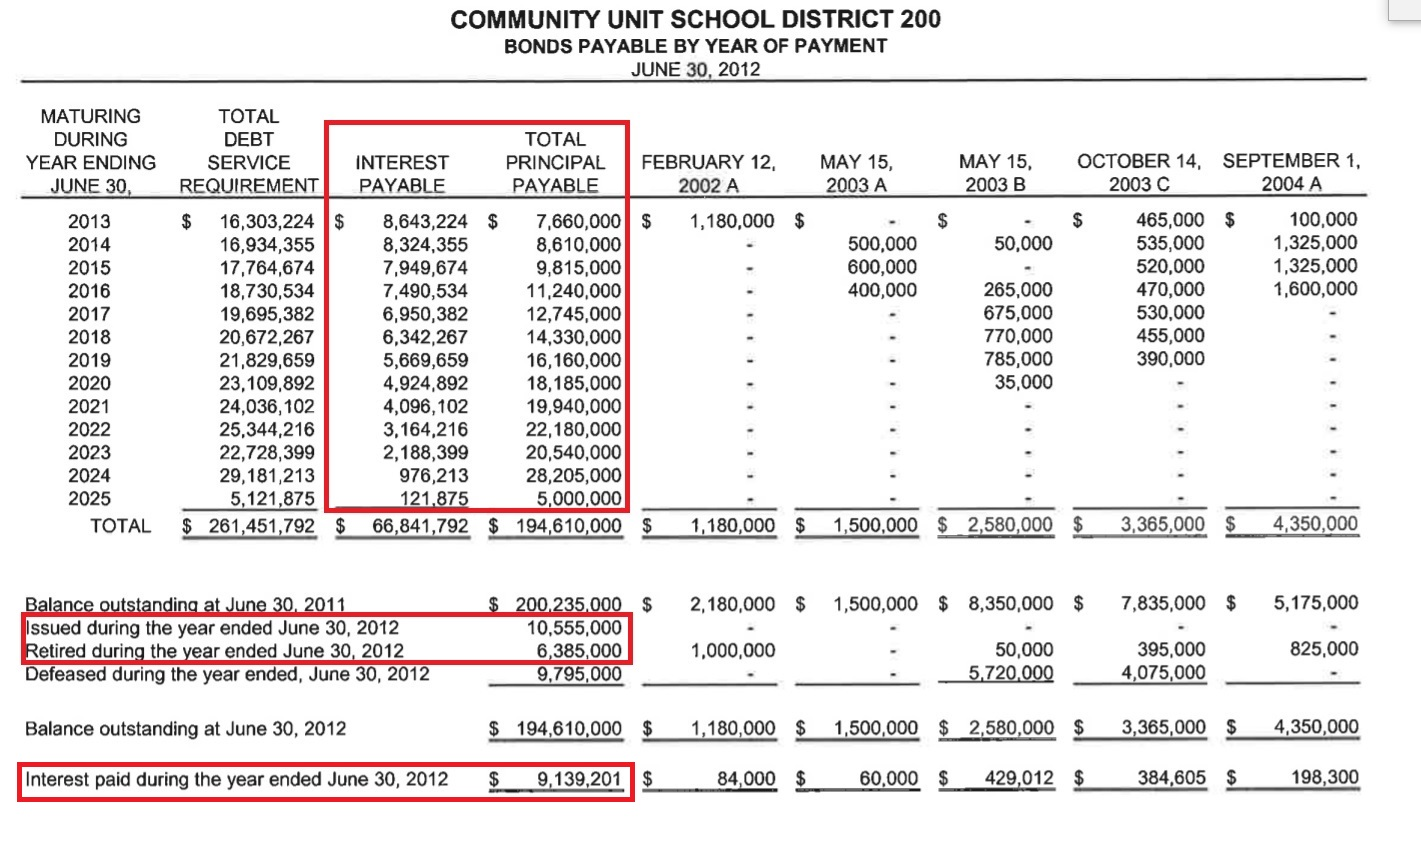 cusd 200 existing bond repayment schedule  u2013 dupage watchdog